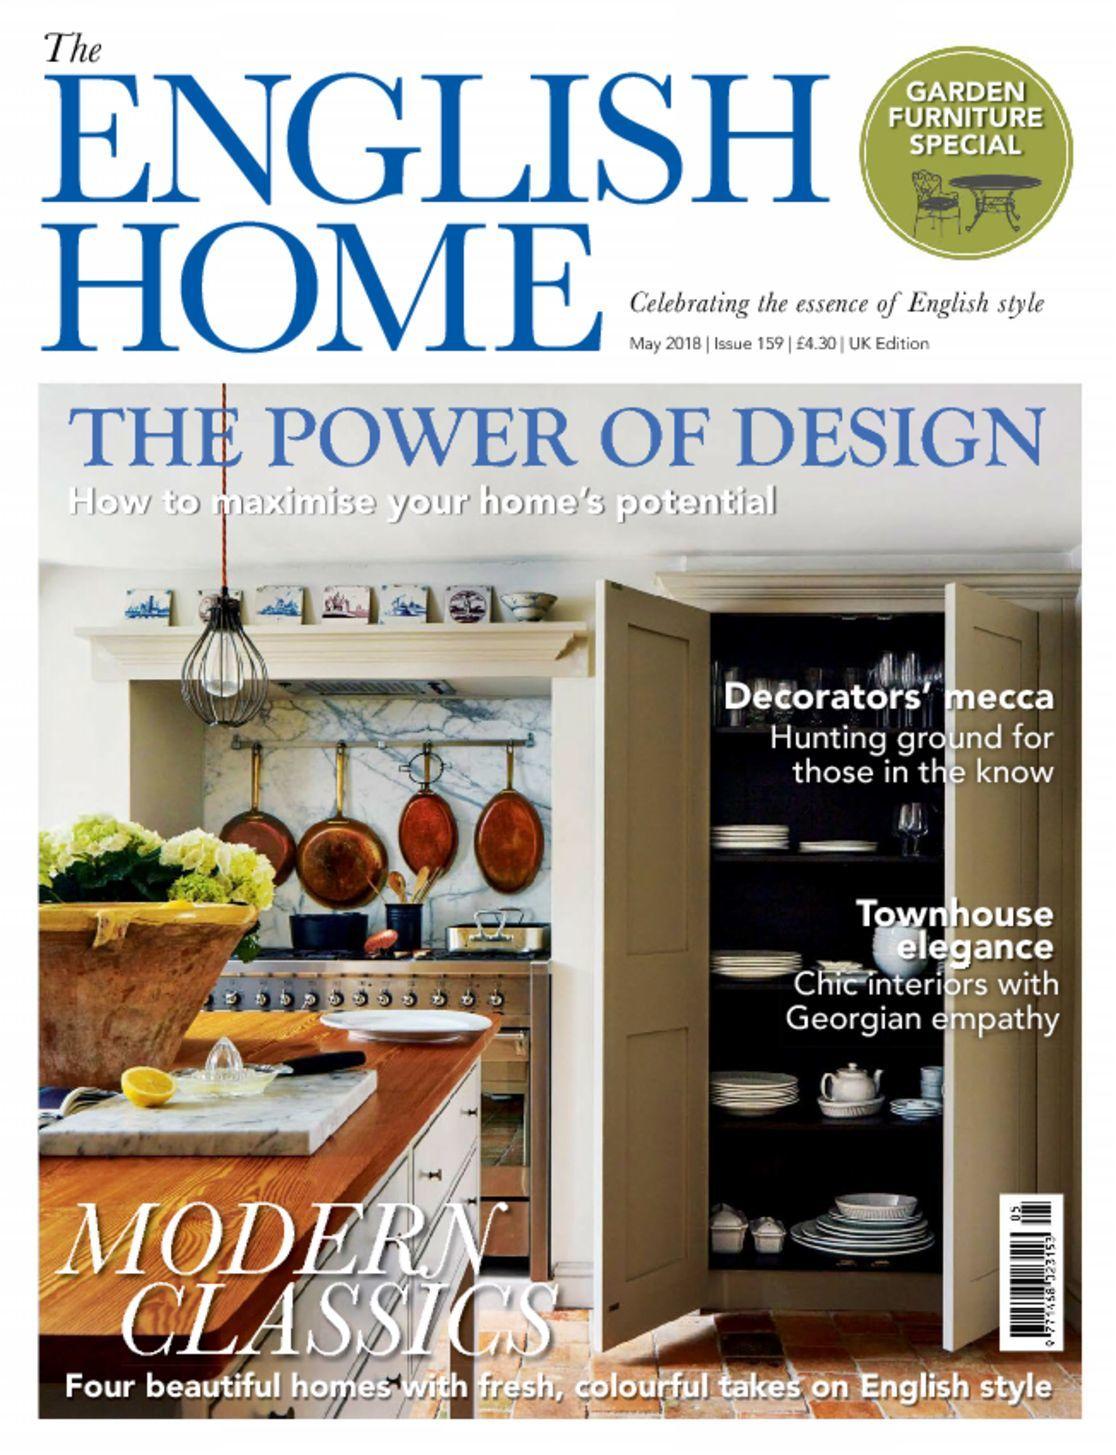 The English Home Magazine Bringing England Home